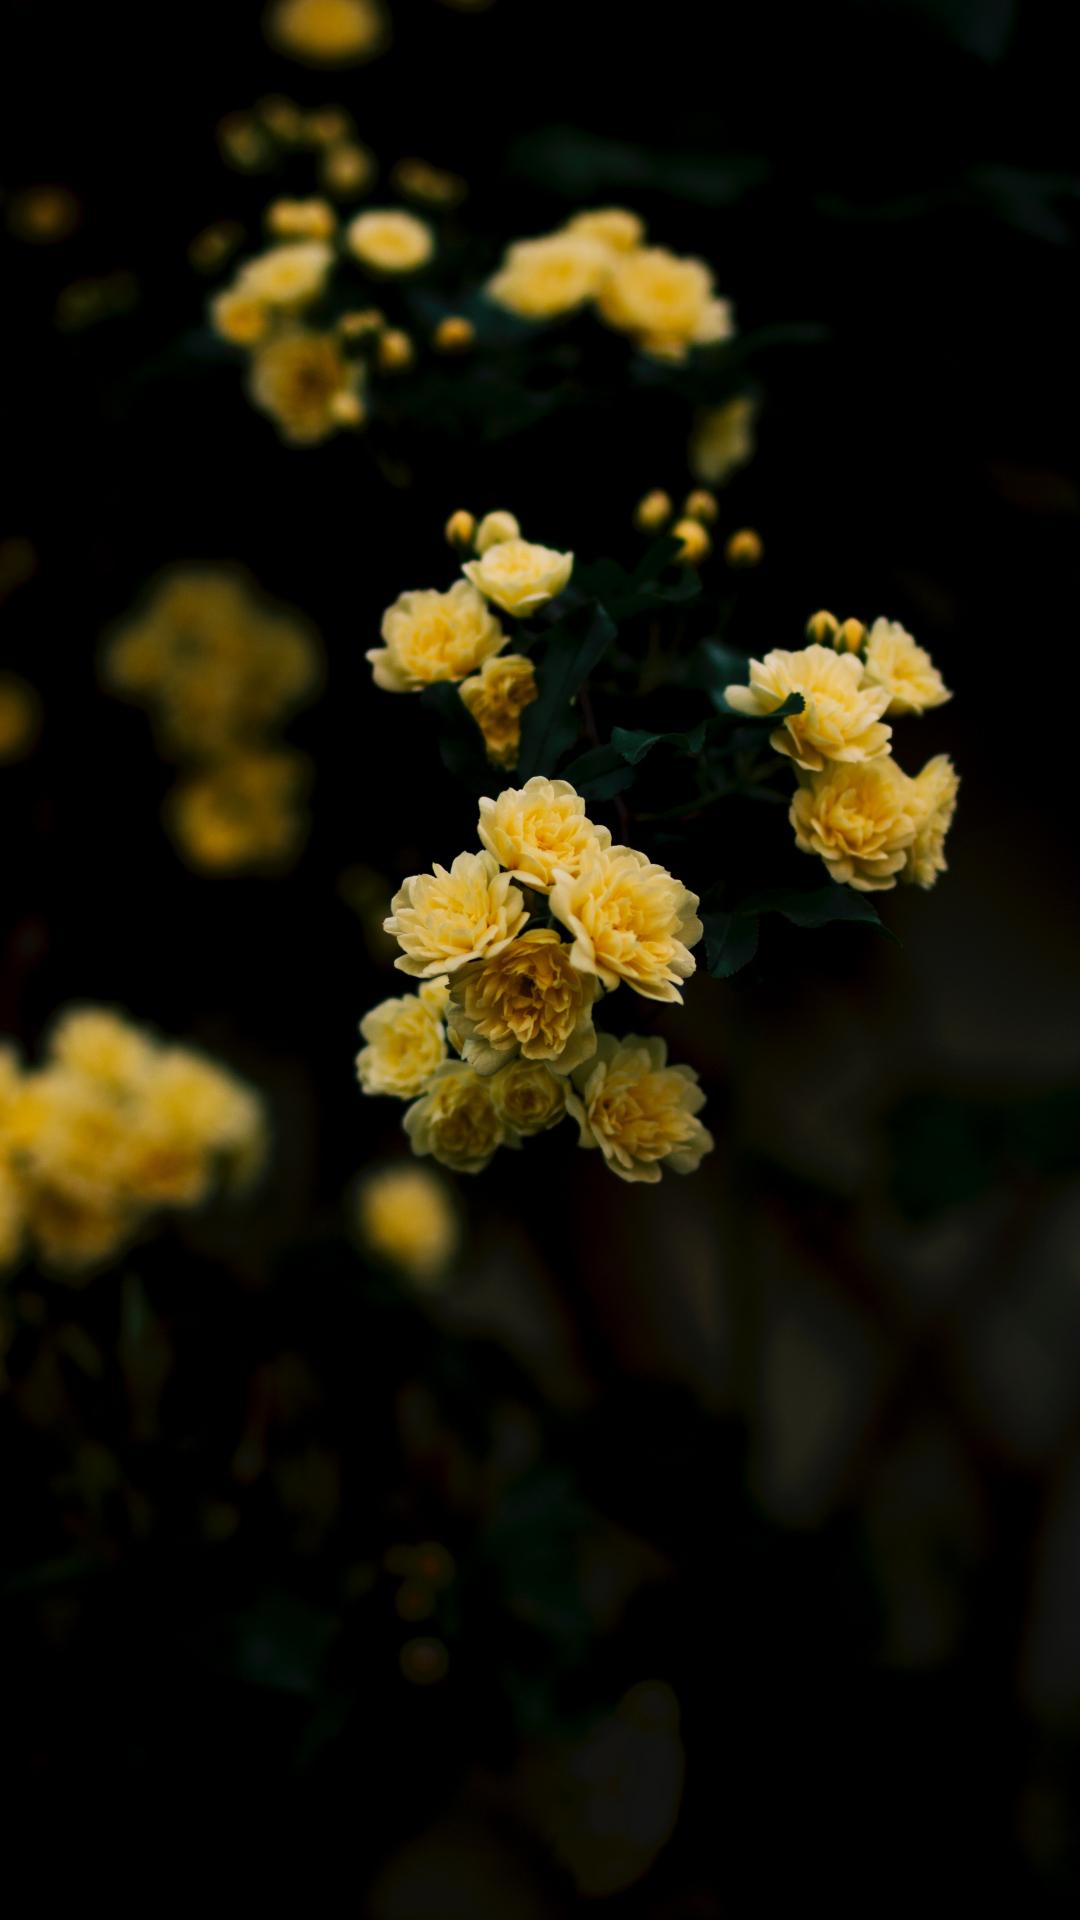 Yellow, Rose Iphone Wallpaper - Yellow Aesthetic Wallpaper Rose - HD Wallpaper